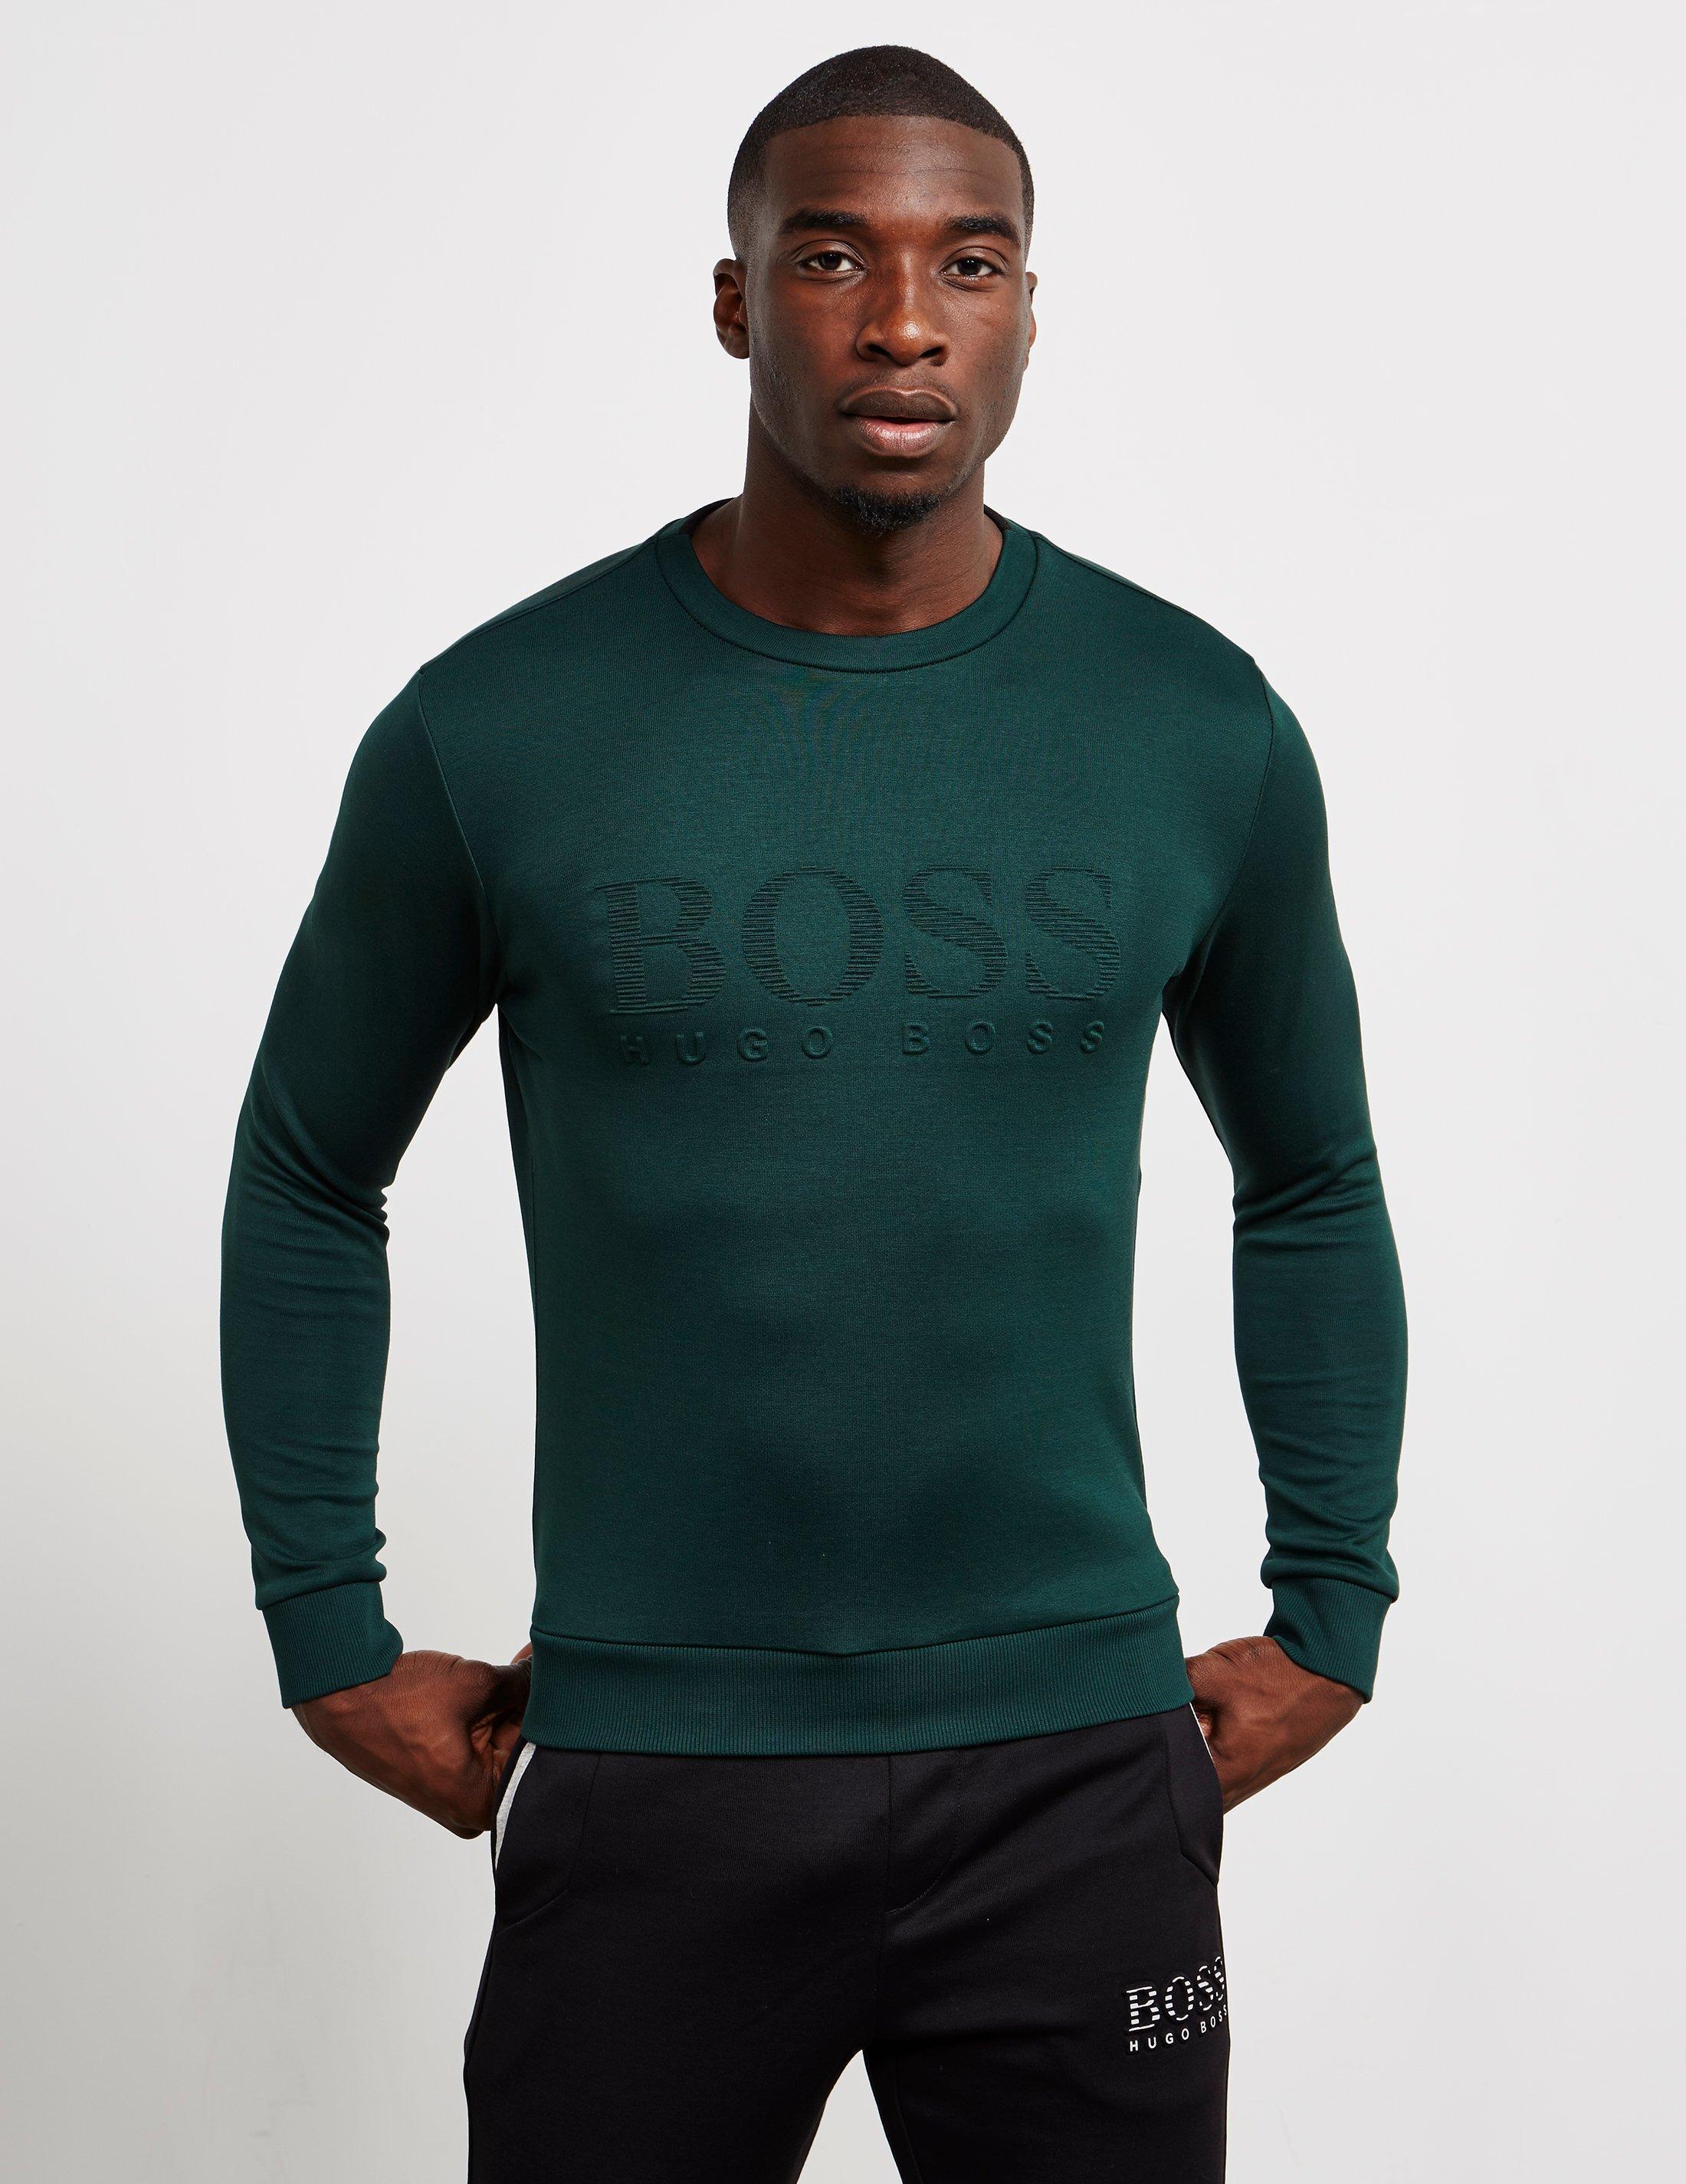 880bd5f97 BOSS - Salbo Sweatshirt Green for Men - Lyst. View fullscreen